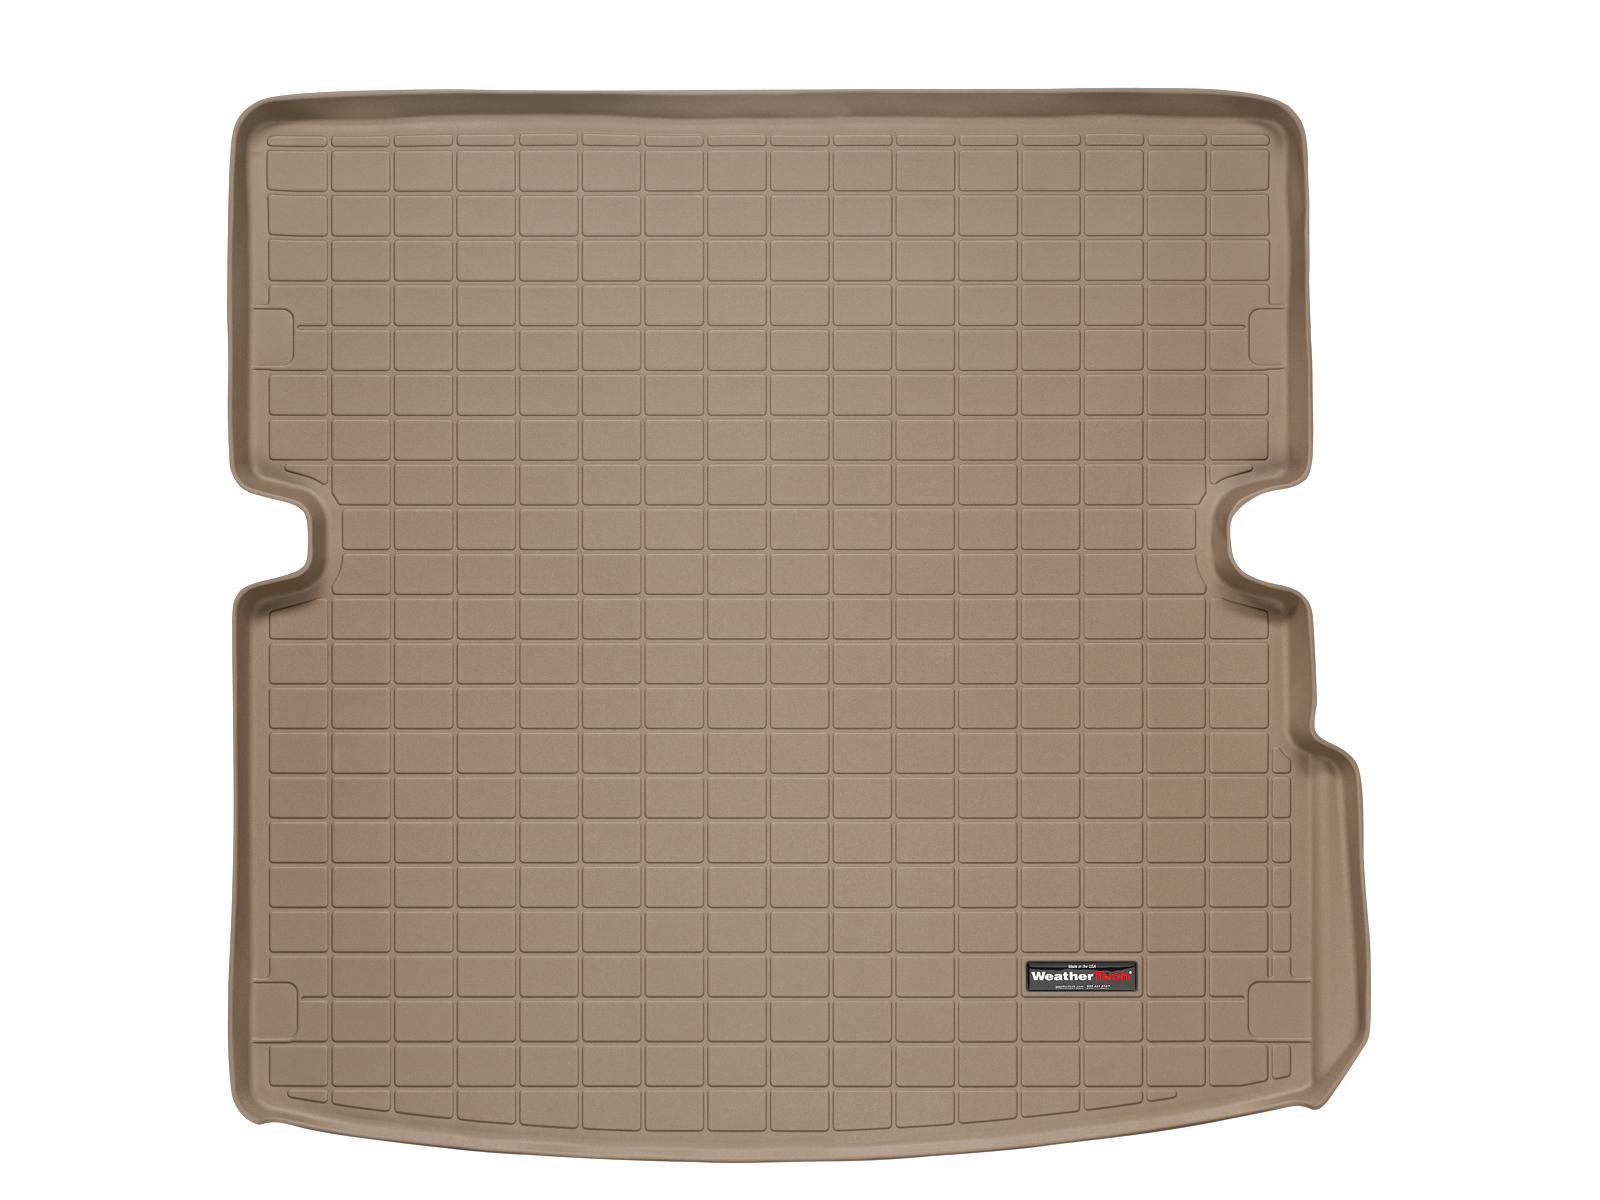 Audi Q7 2006>2013 Vasca proteggi baule tappeto bagagliaio marrone *101